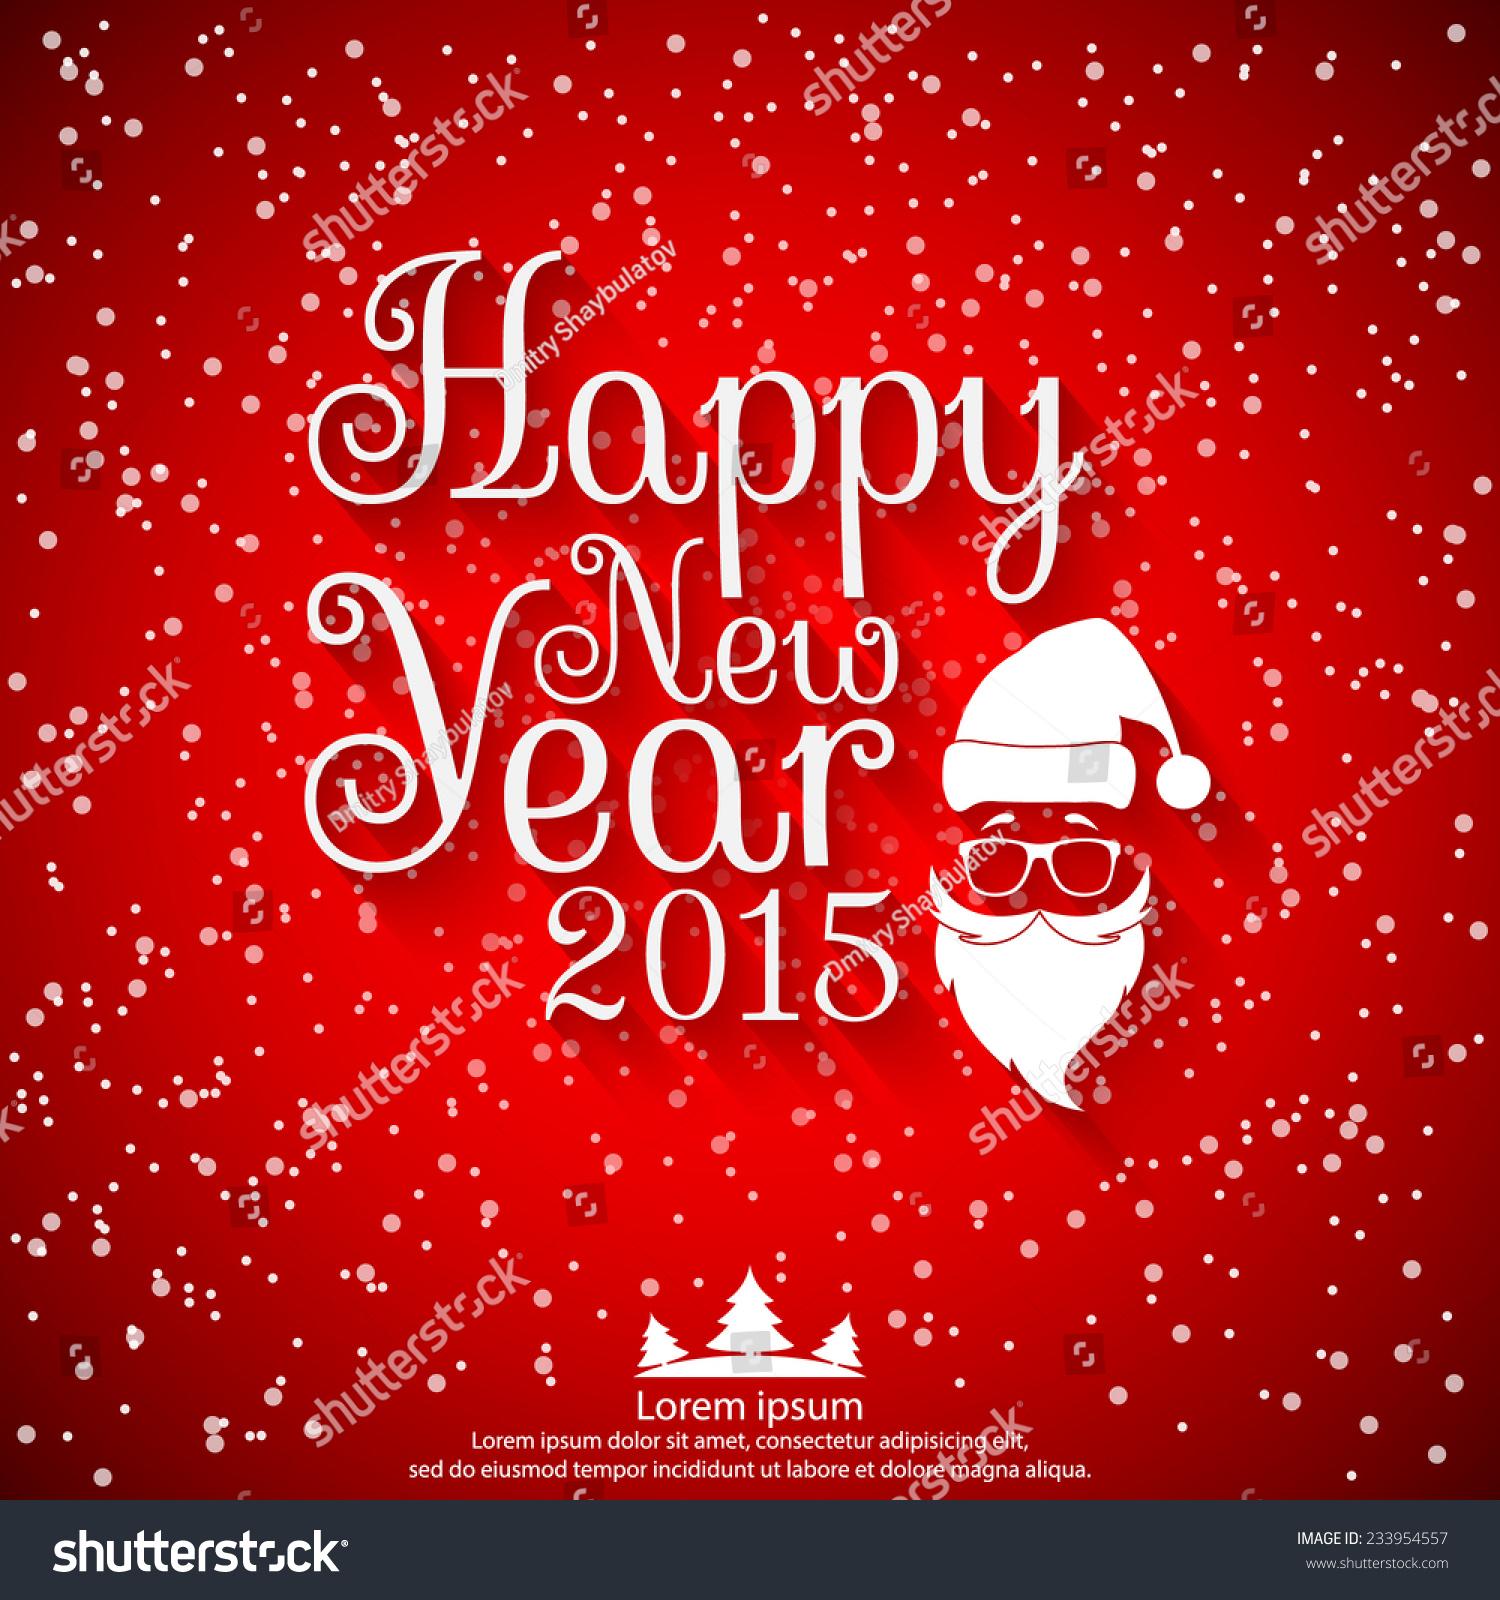 Happy New Year 2015 Vector Illustration Stock Vector 233954557 ...